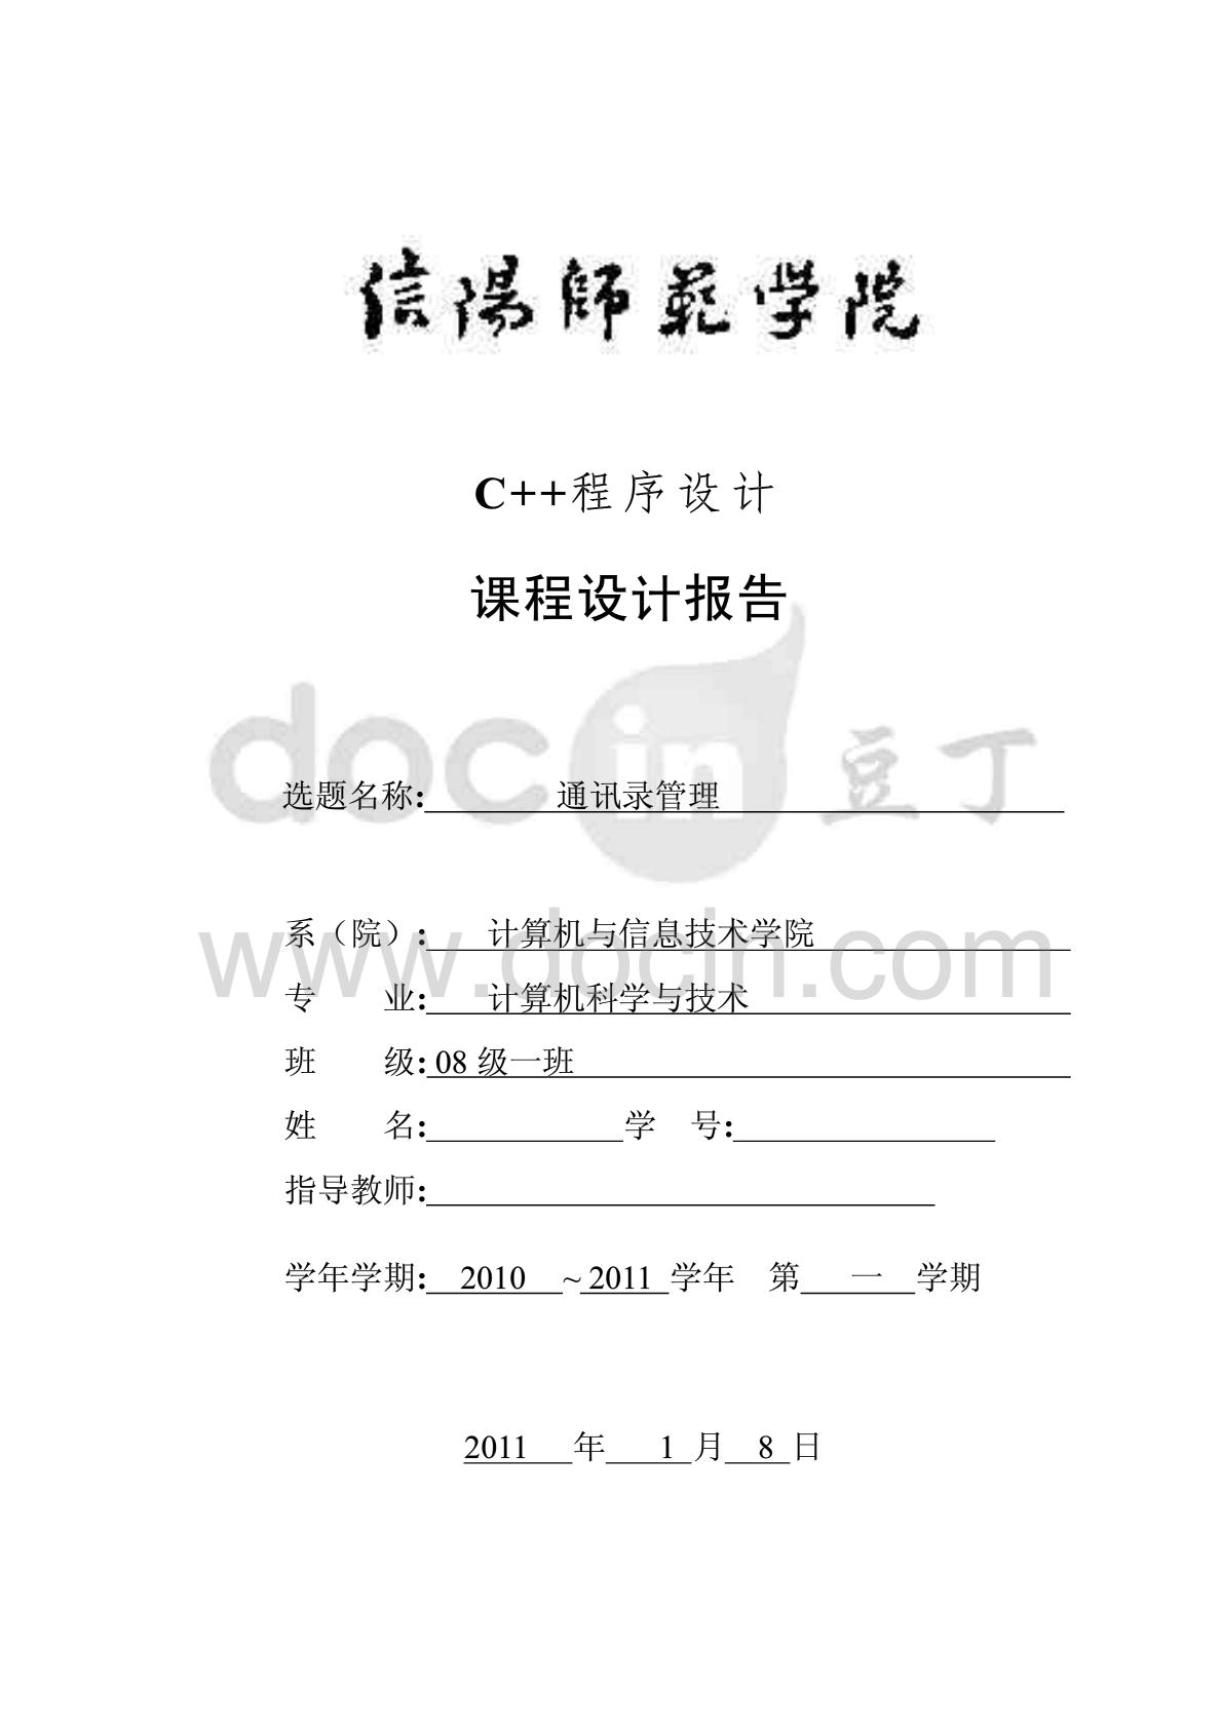 c++mfc实践报告_毕业设计报告 c语言程序设计 mfc课程设计报告 通讯录系统 设计 c